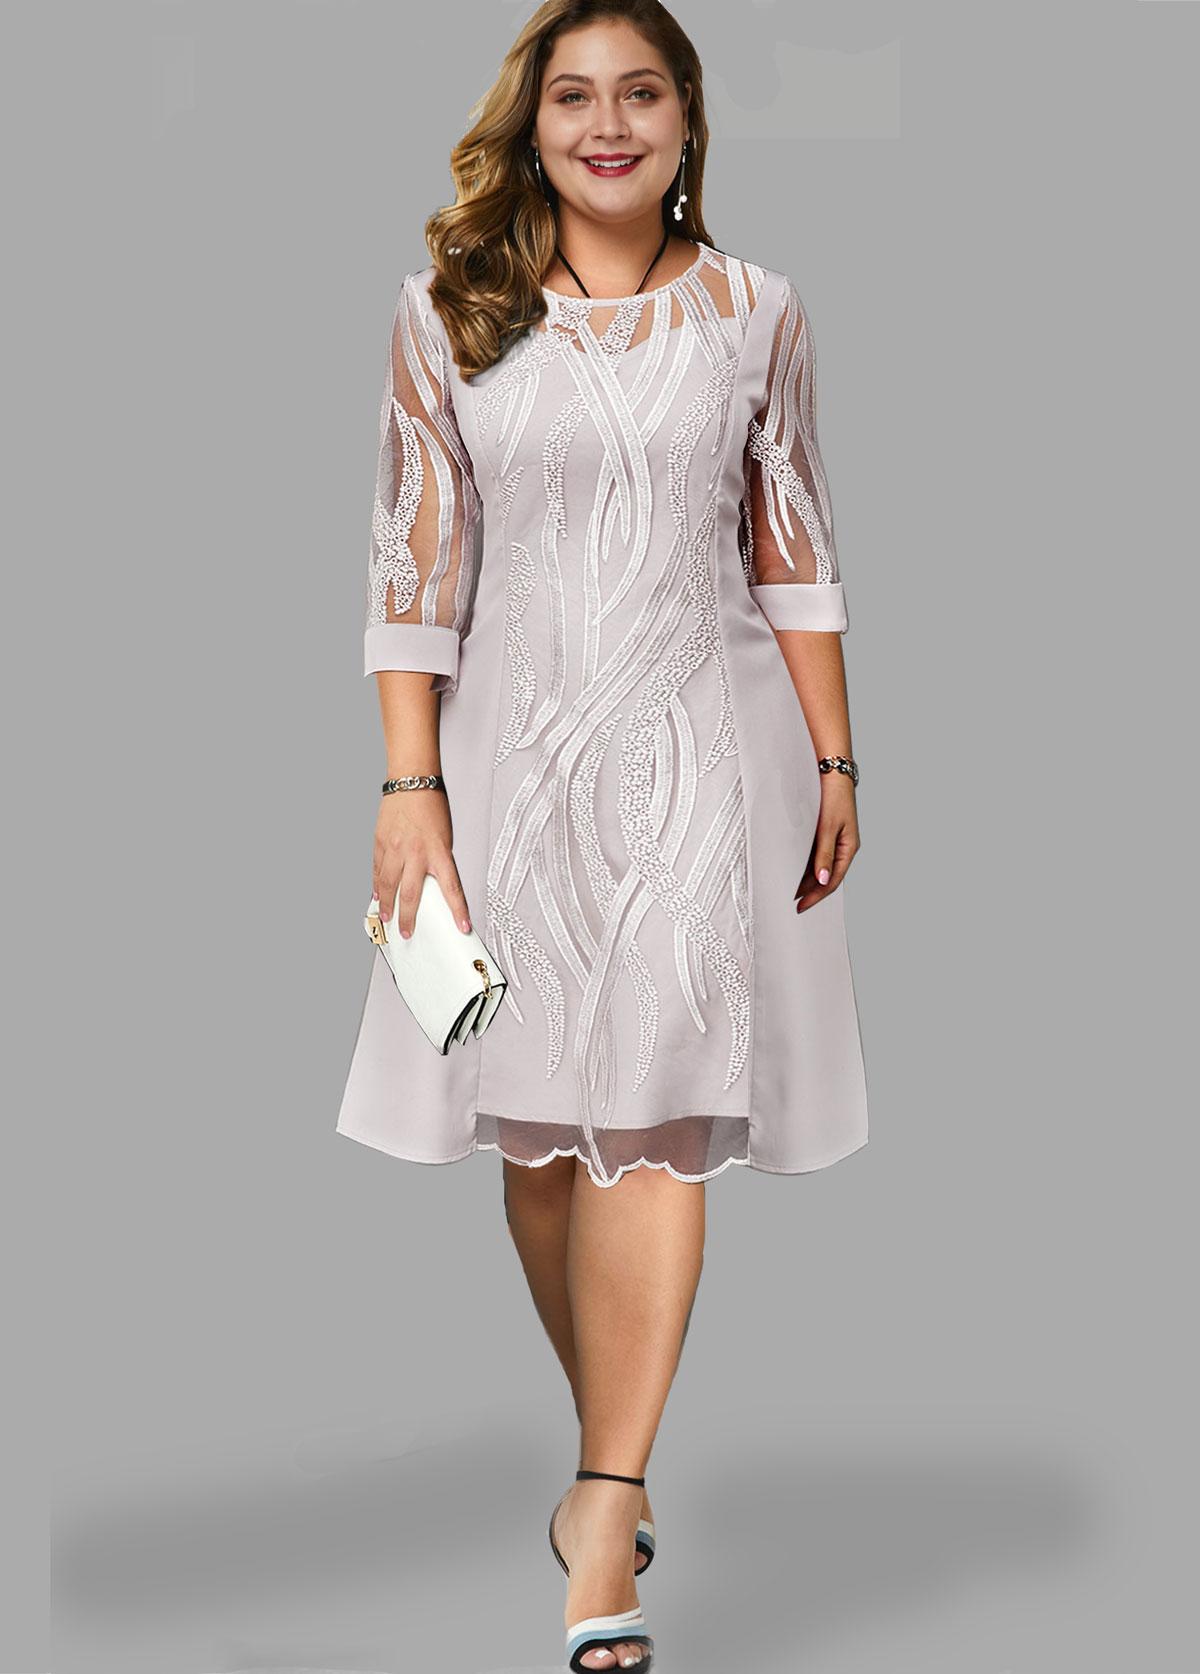 ROTITA Plus Size Three Quarter Sleeve Round Neck Lace Dress